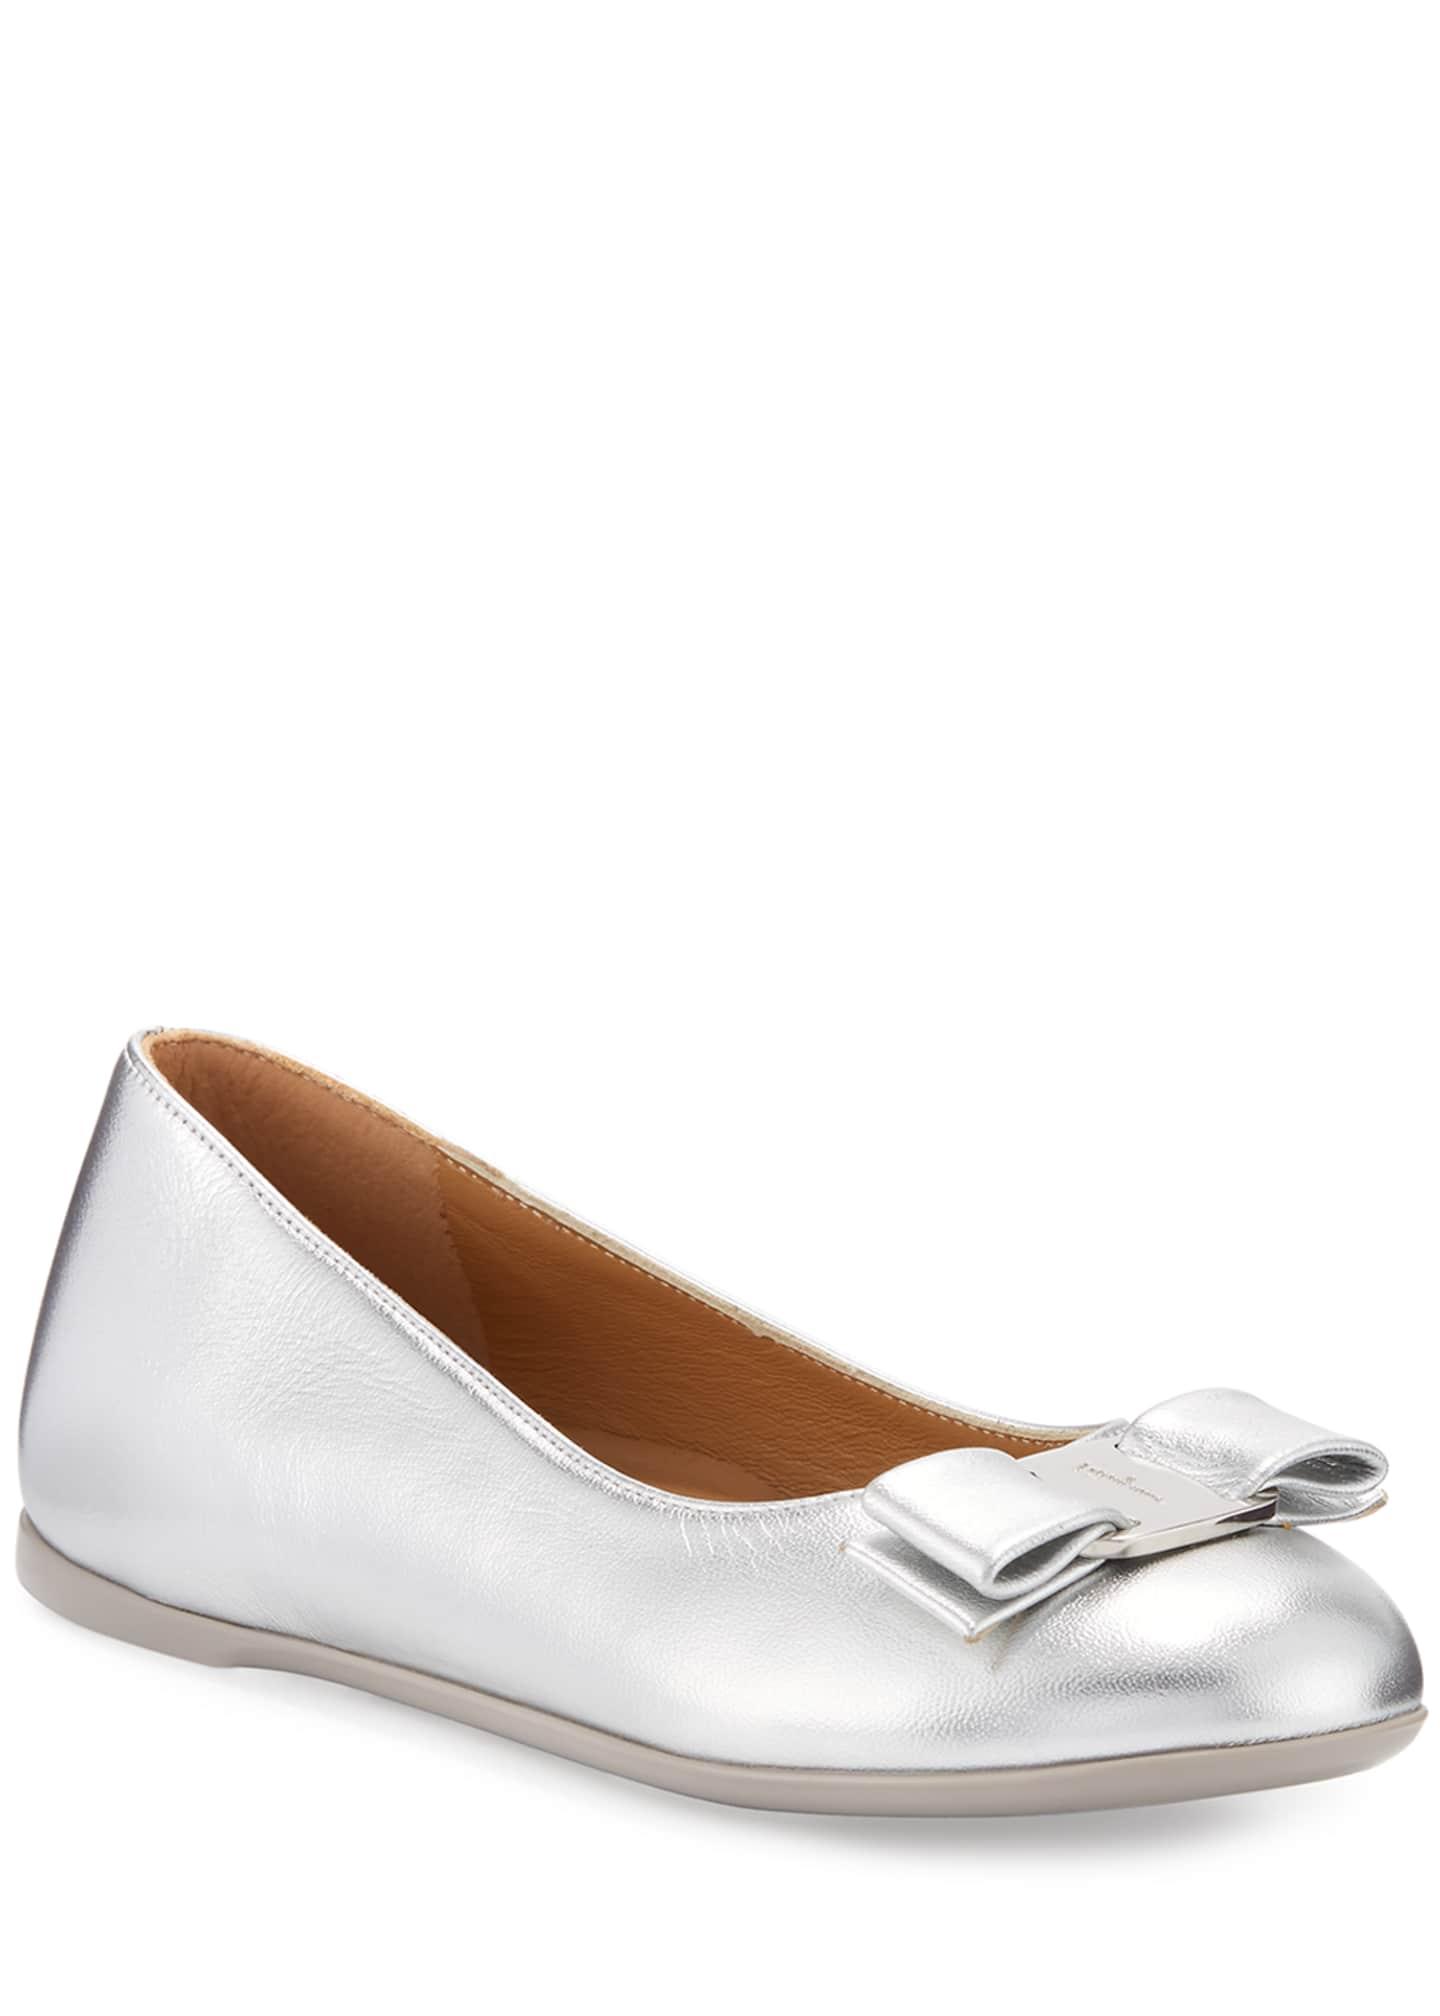 Salvatore Ferragamo Varina Mini Leather Ballet Flats, 10T-2Y